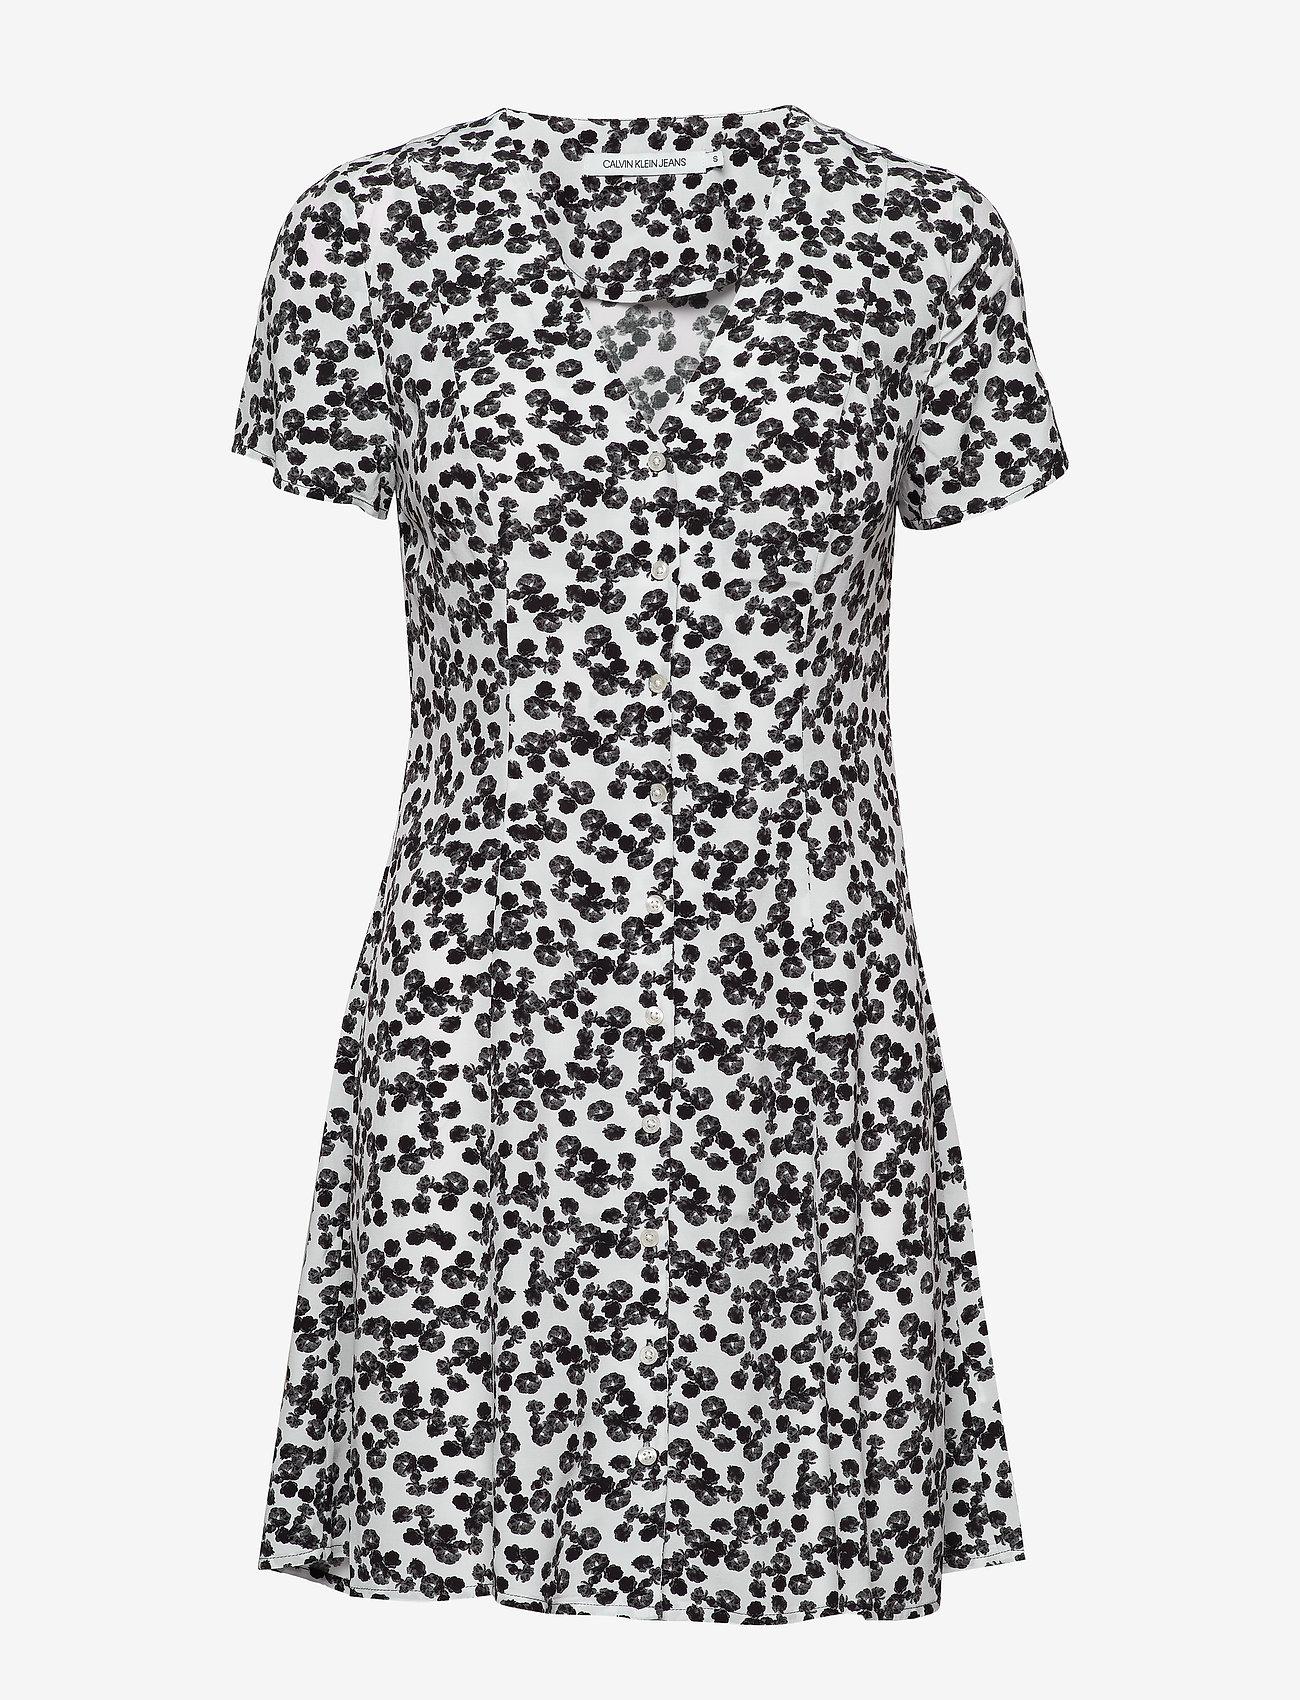 Calvin Klein Jeans - FLORAL  SS DRESS - hverdagskjoler - white with black peony floral - 0